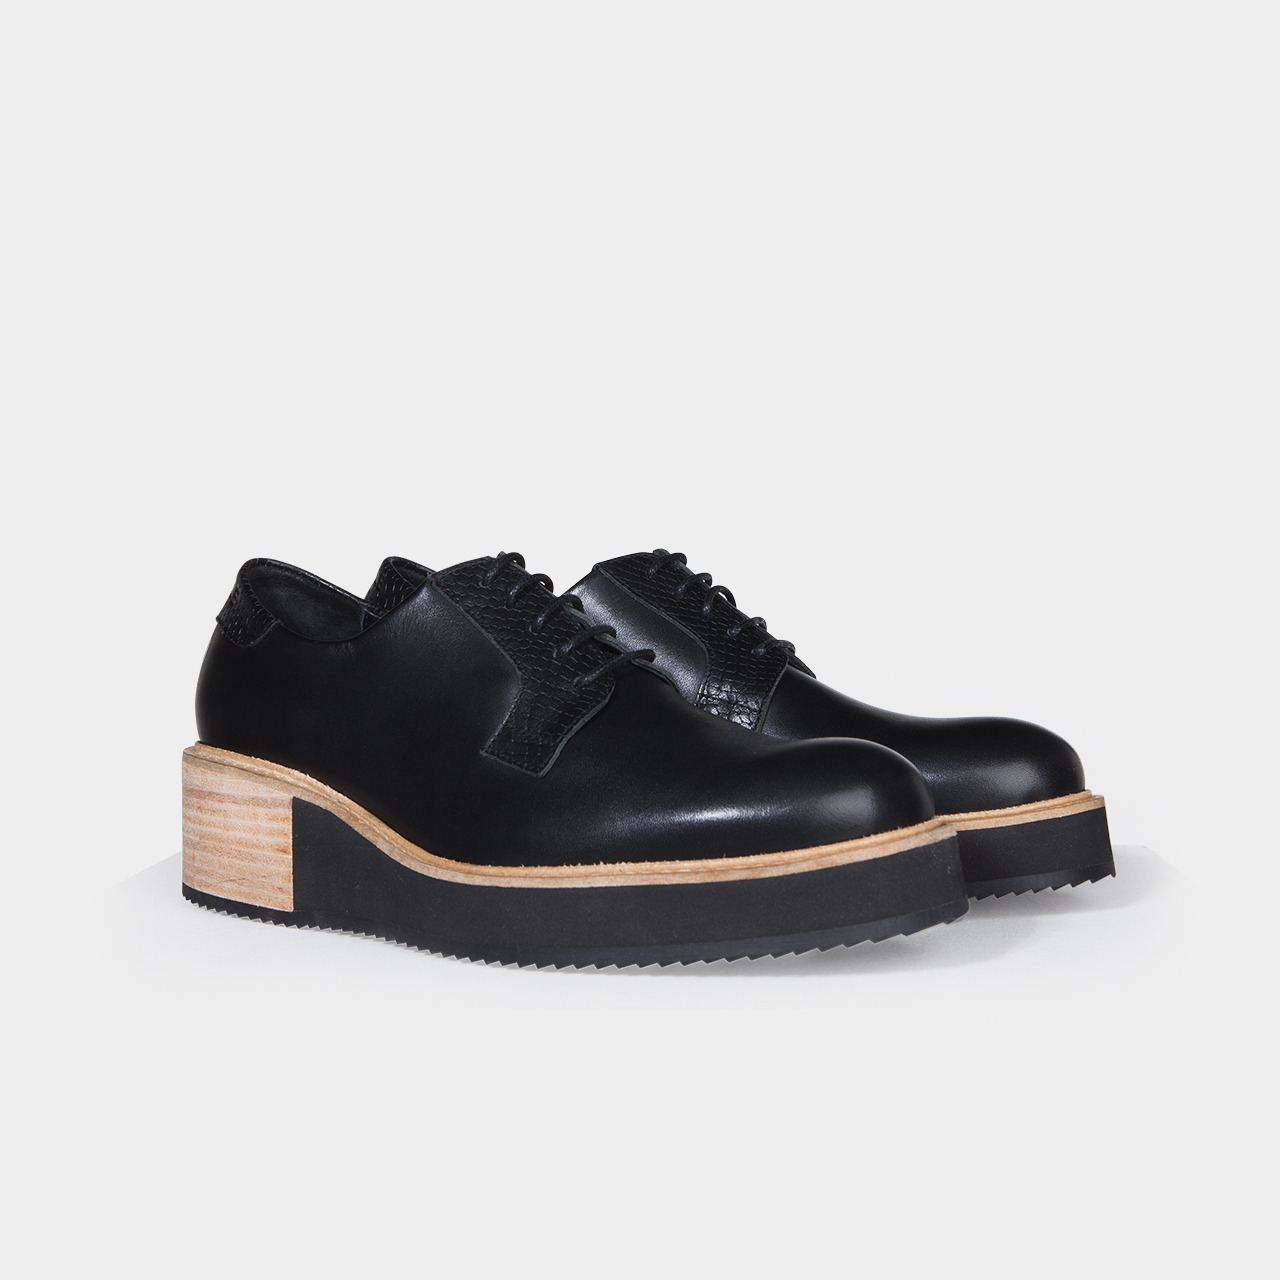 chaussure derbies compens es femme alpha high noir subtle shoes. Black Bedroom Furniture Sets. Home Design Ideas